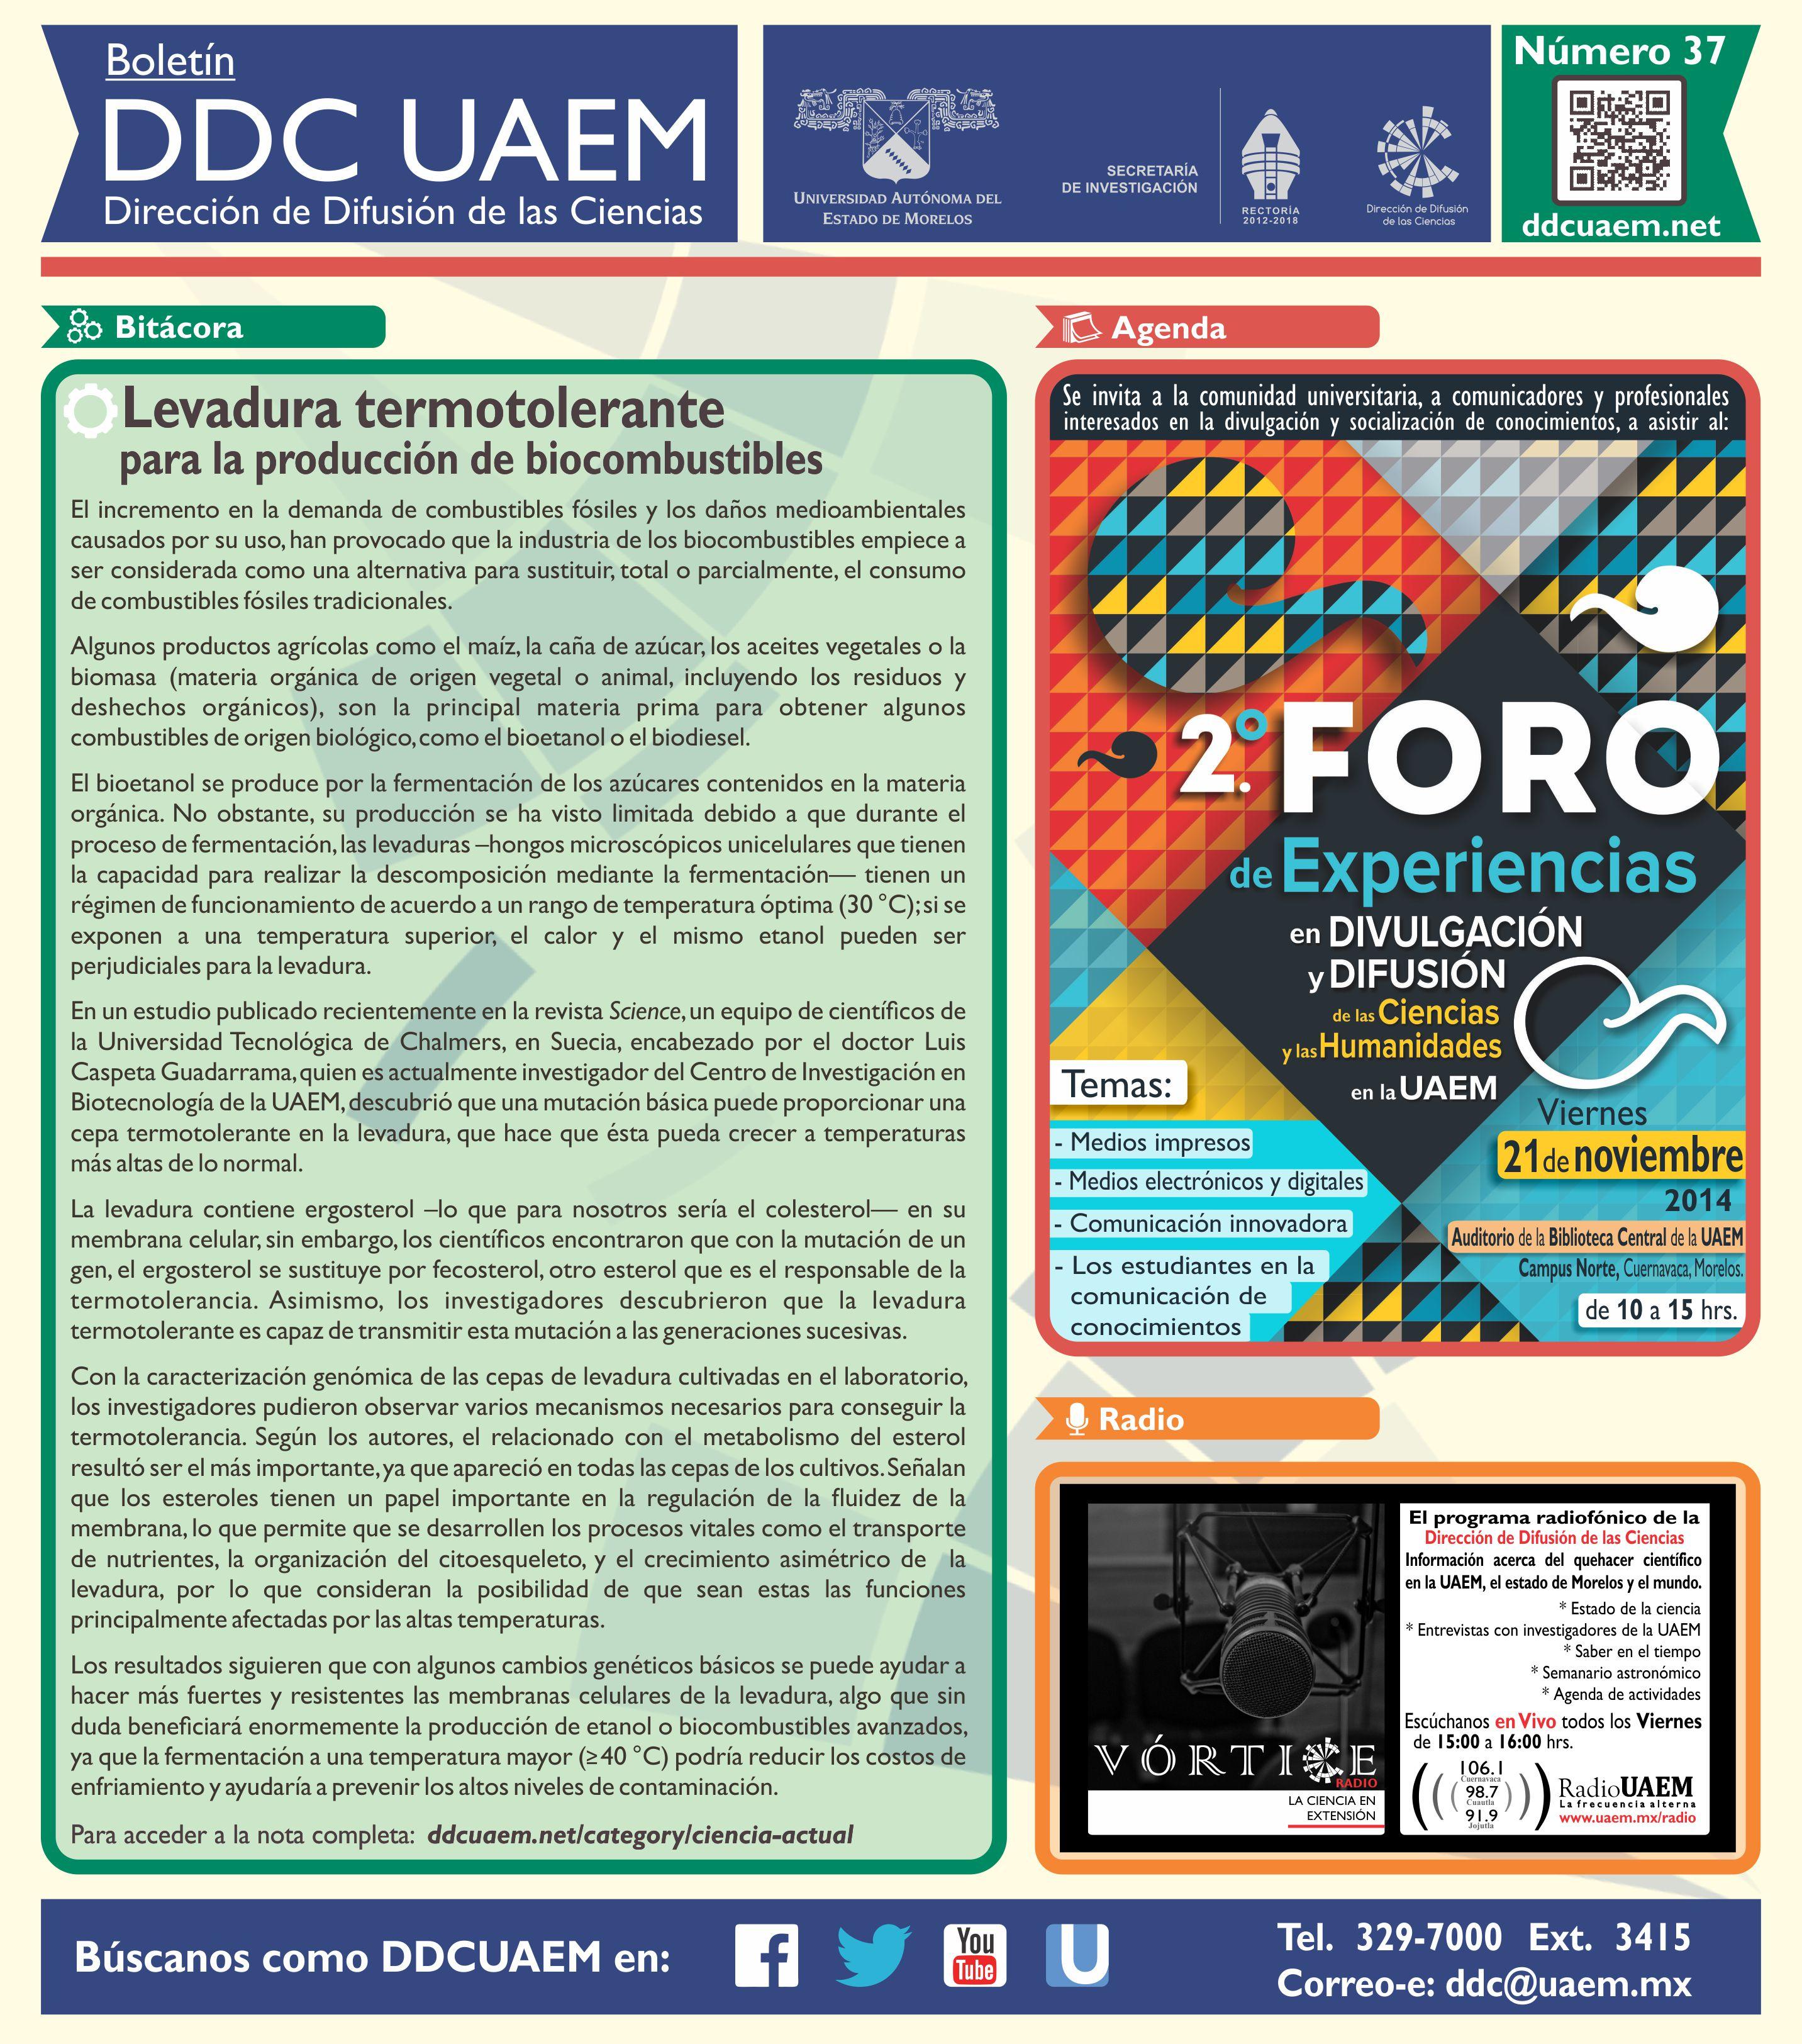 Boletín DDC 37 -RS